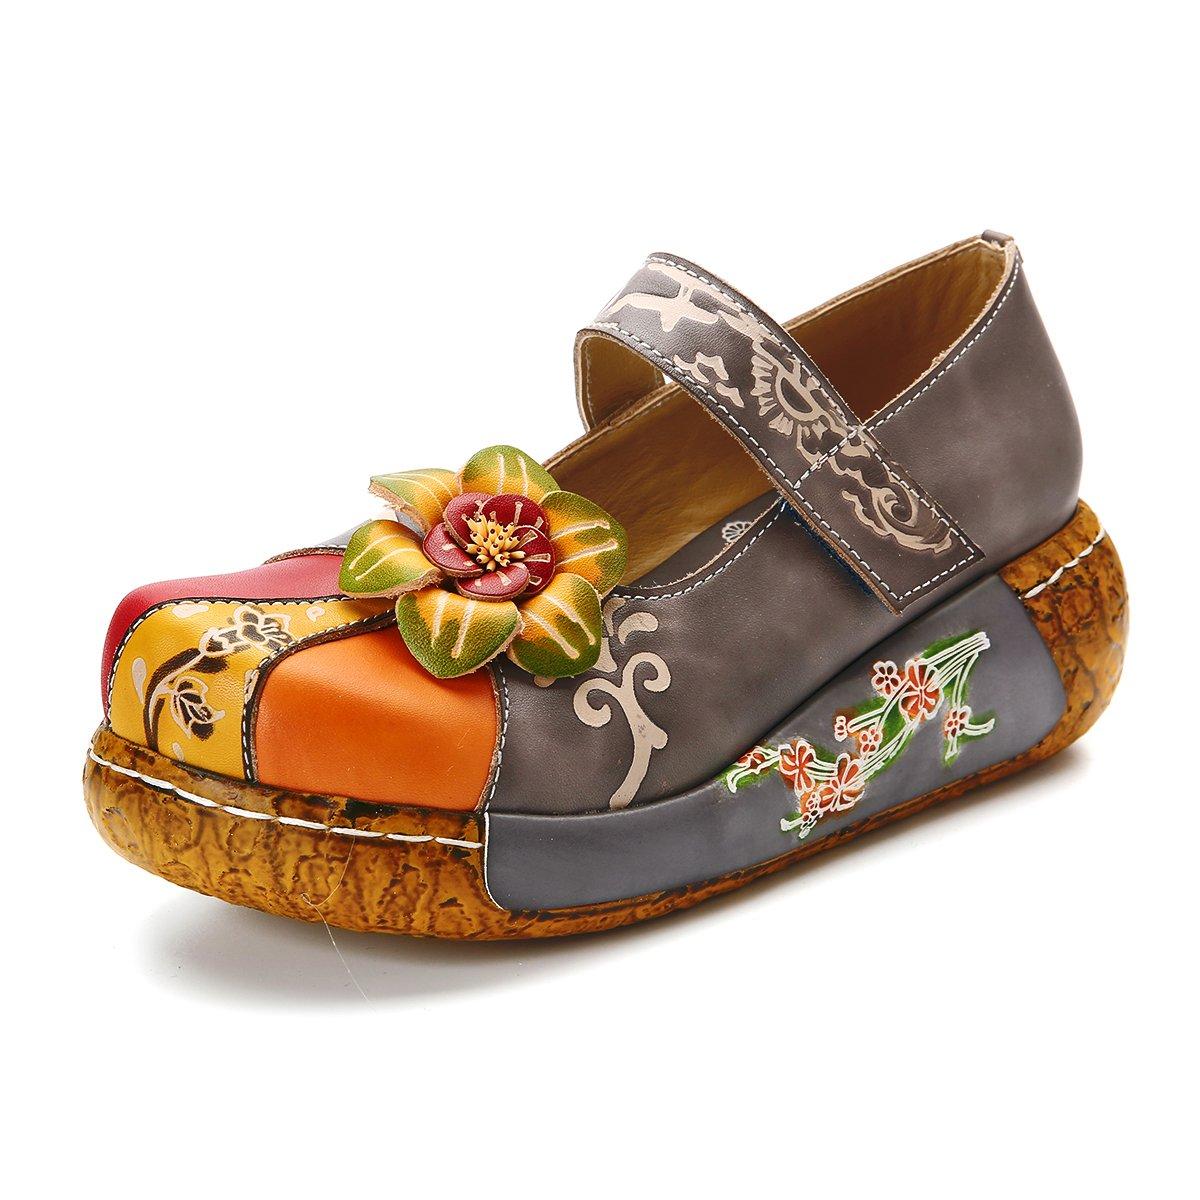 Gracosy Damen Sandalen, Sommer Leder Pantoffel Vintage Slipper Rückenfrei Clogs Bunte Blume Schuhe Weich Komfortabel  41 EU Grau-6